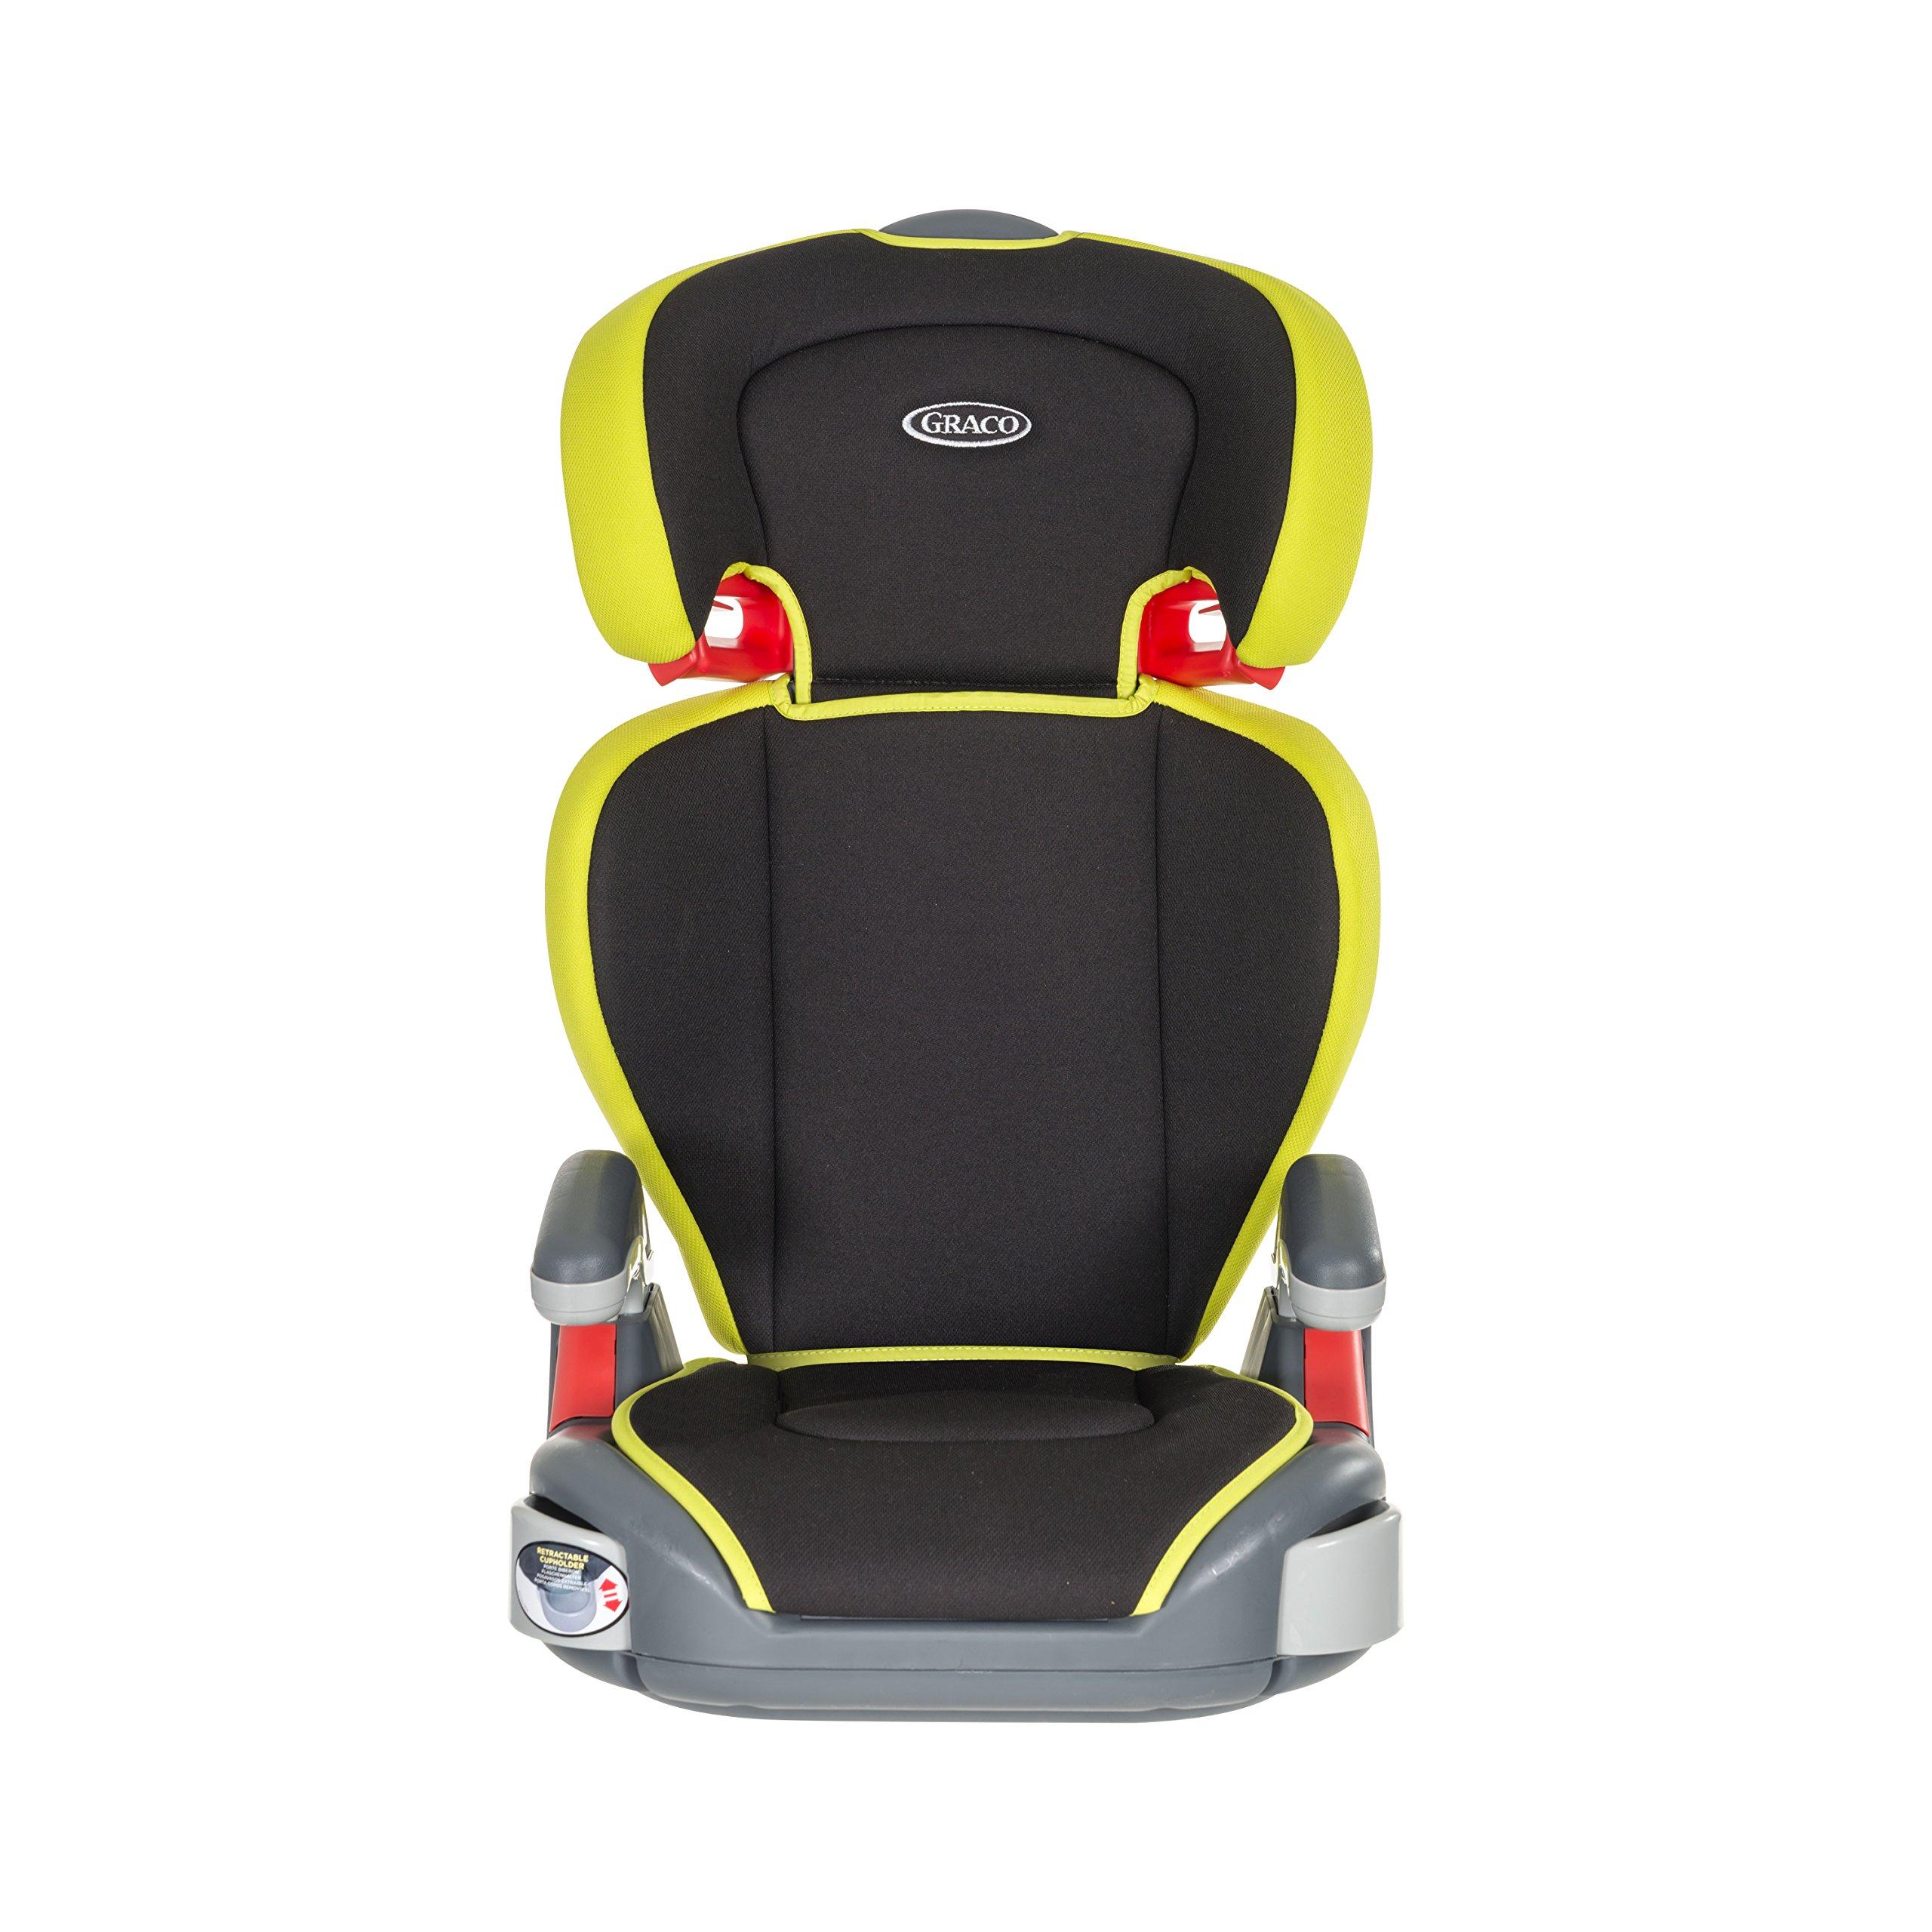 Graco Junior Maxi Group 2/3 Car Seat